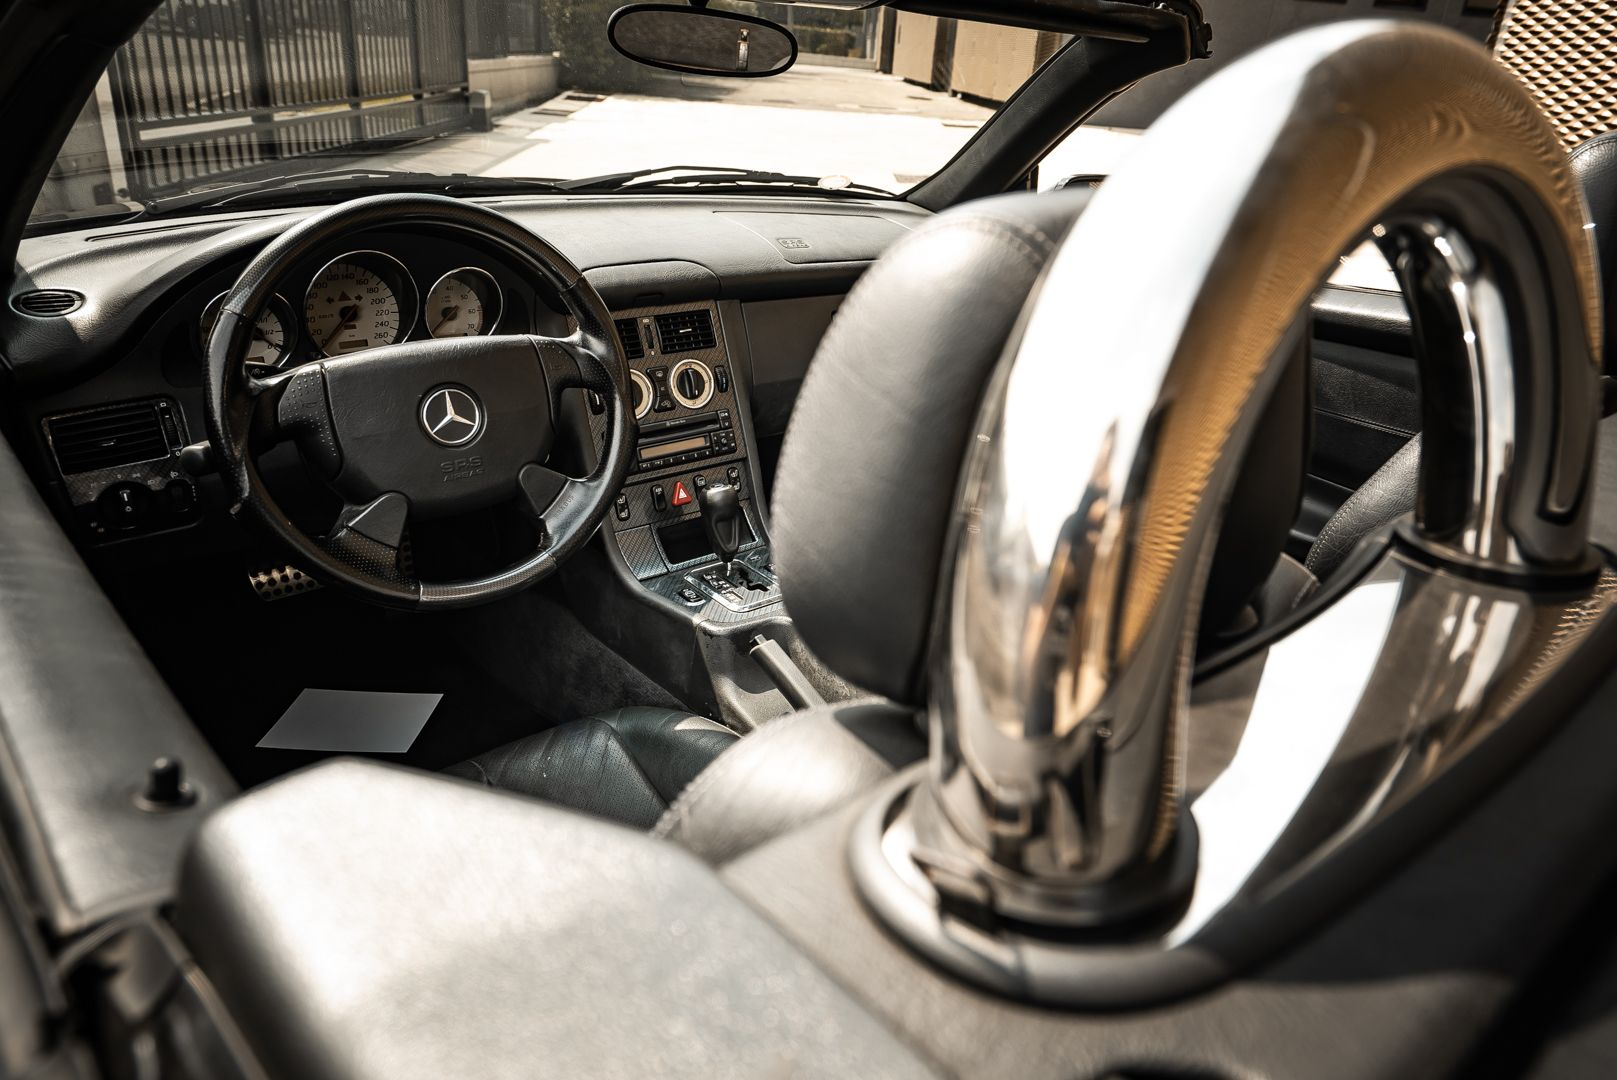 1998 Mercedes-Benz SLK 230 Brabus K1 73753